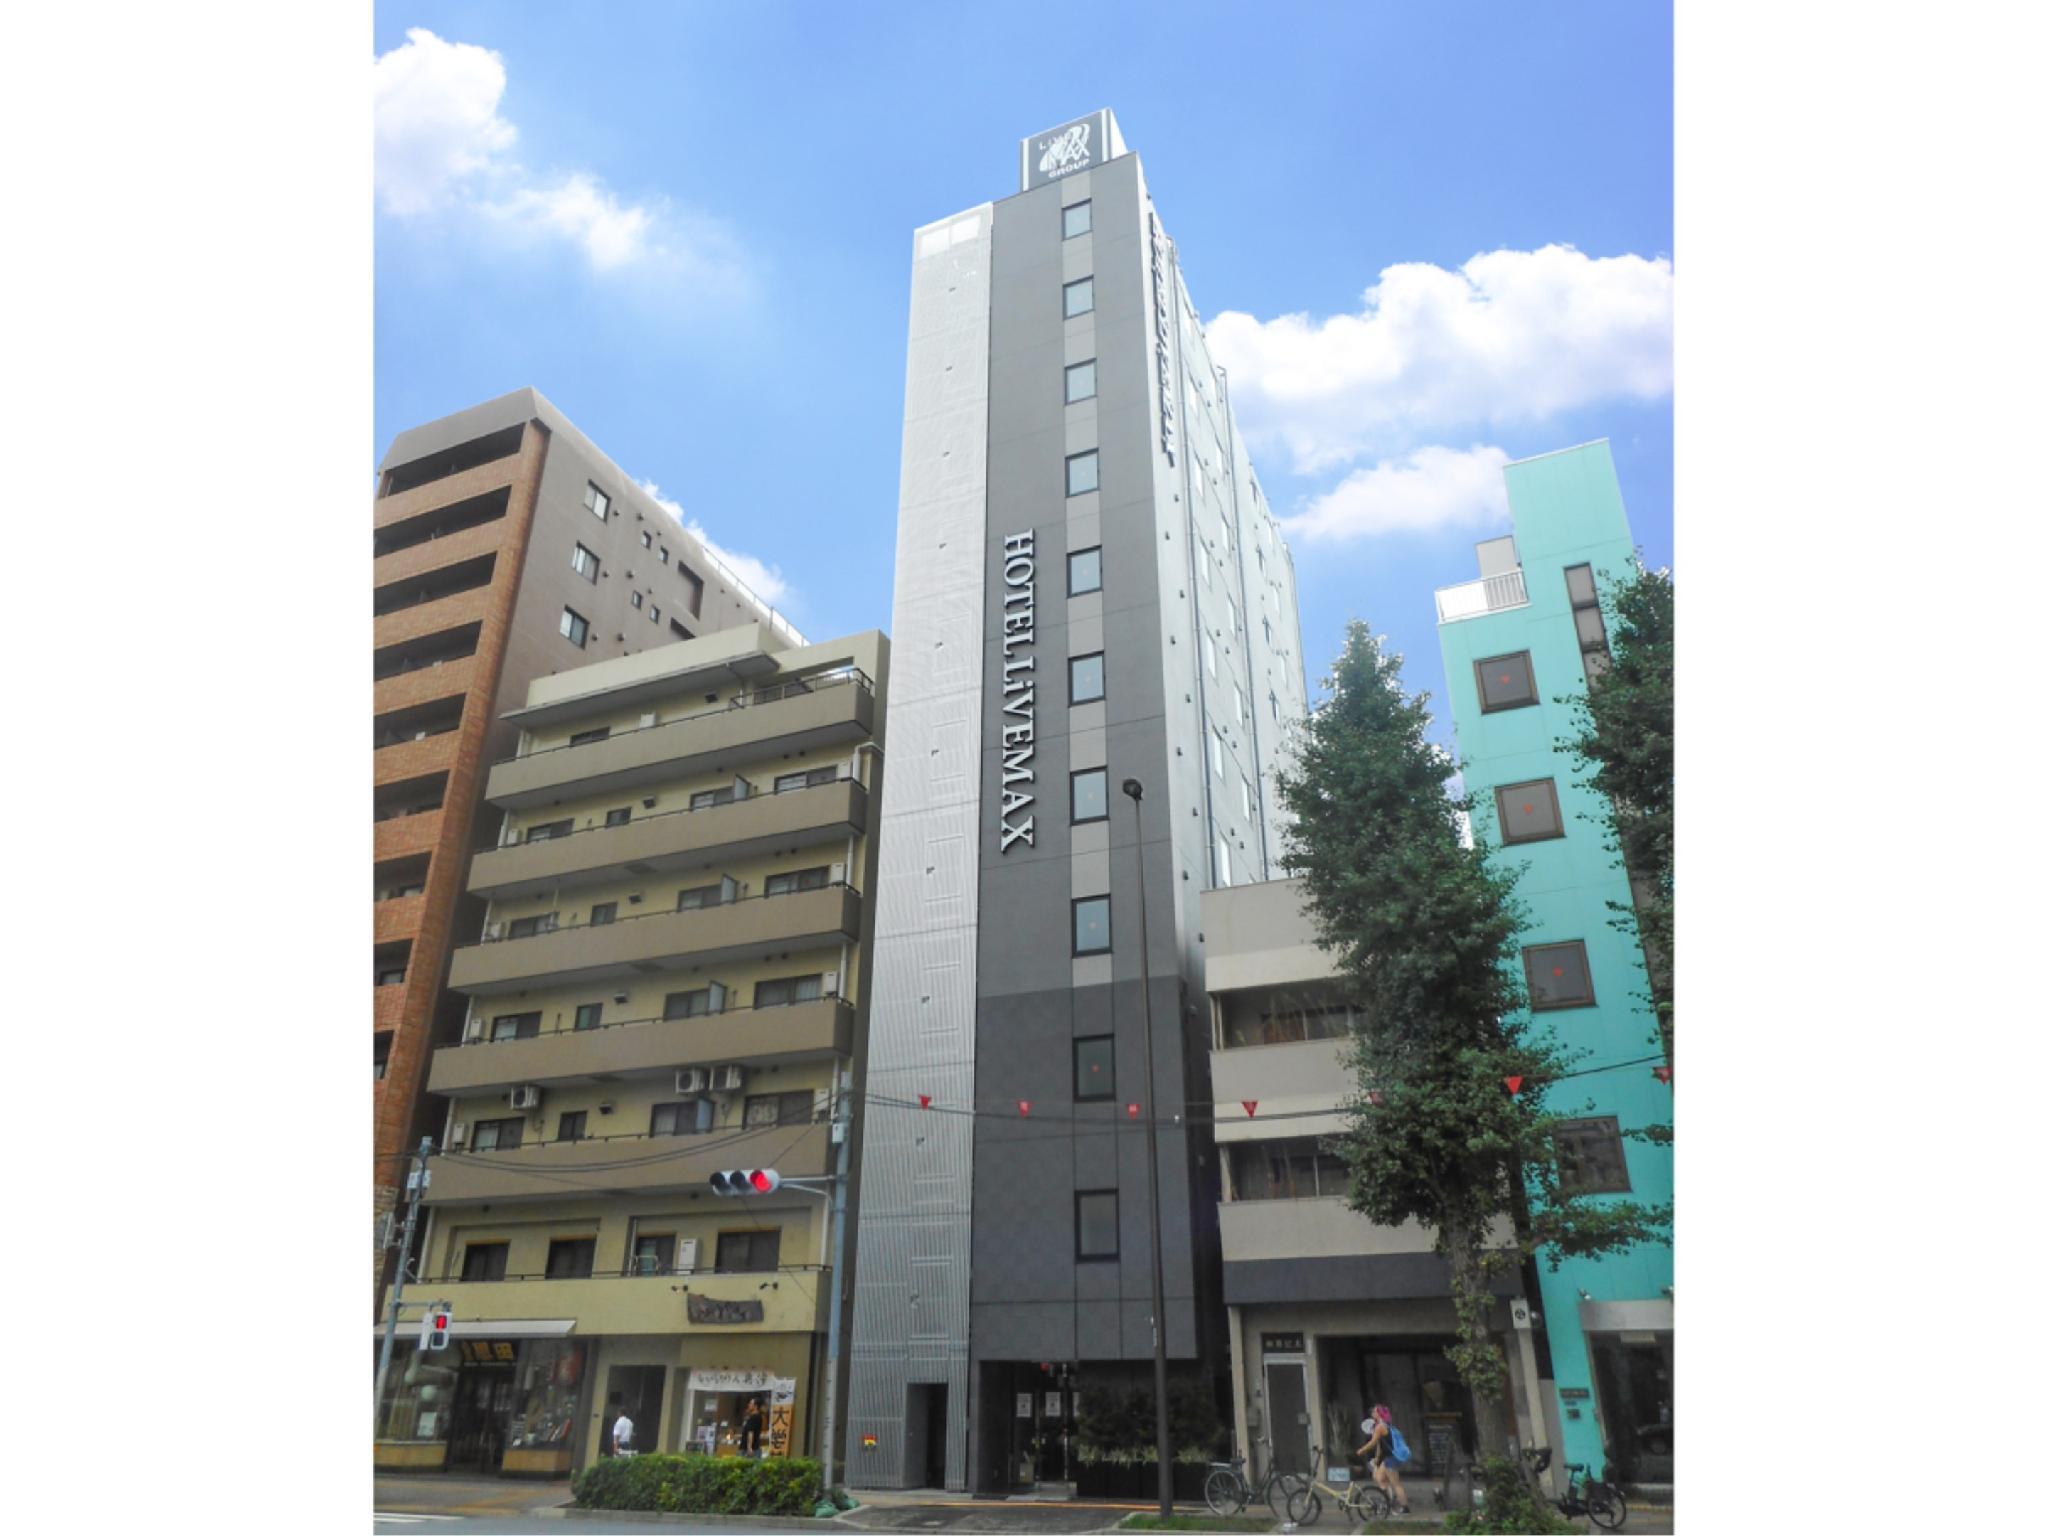 Hotel LiVEMAX Asakusa Komakata